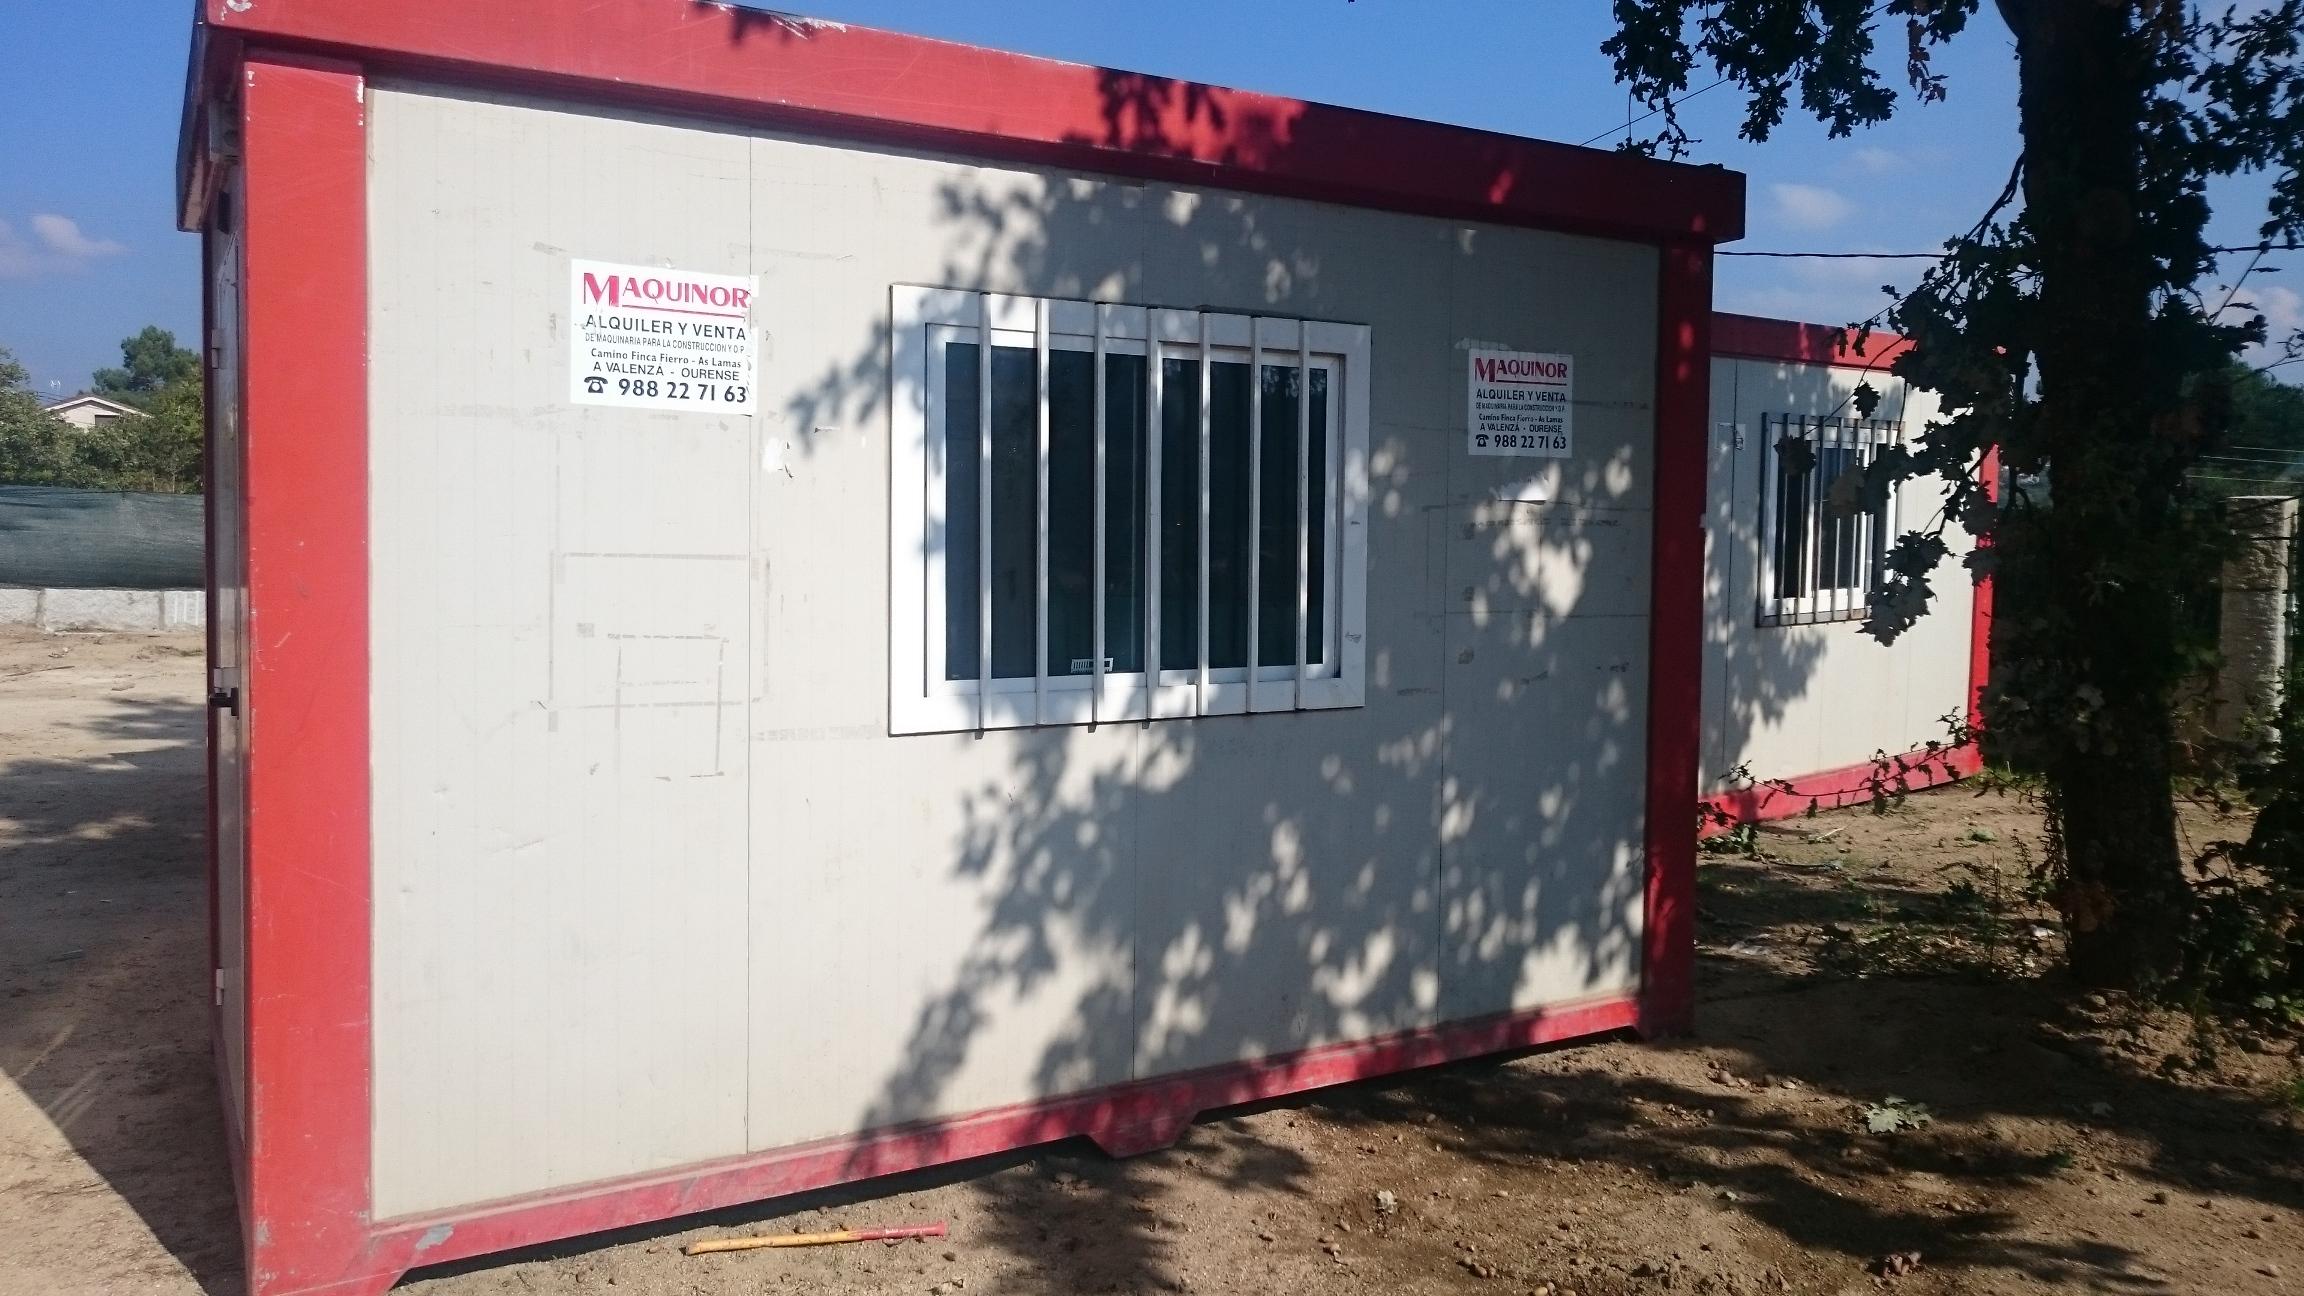 Casetas contenedores y ba os maquinor for Casetas para banos